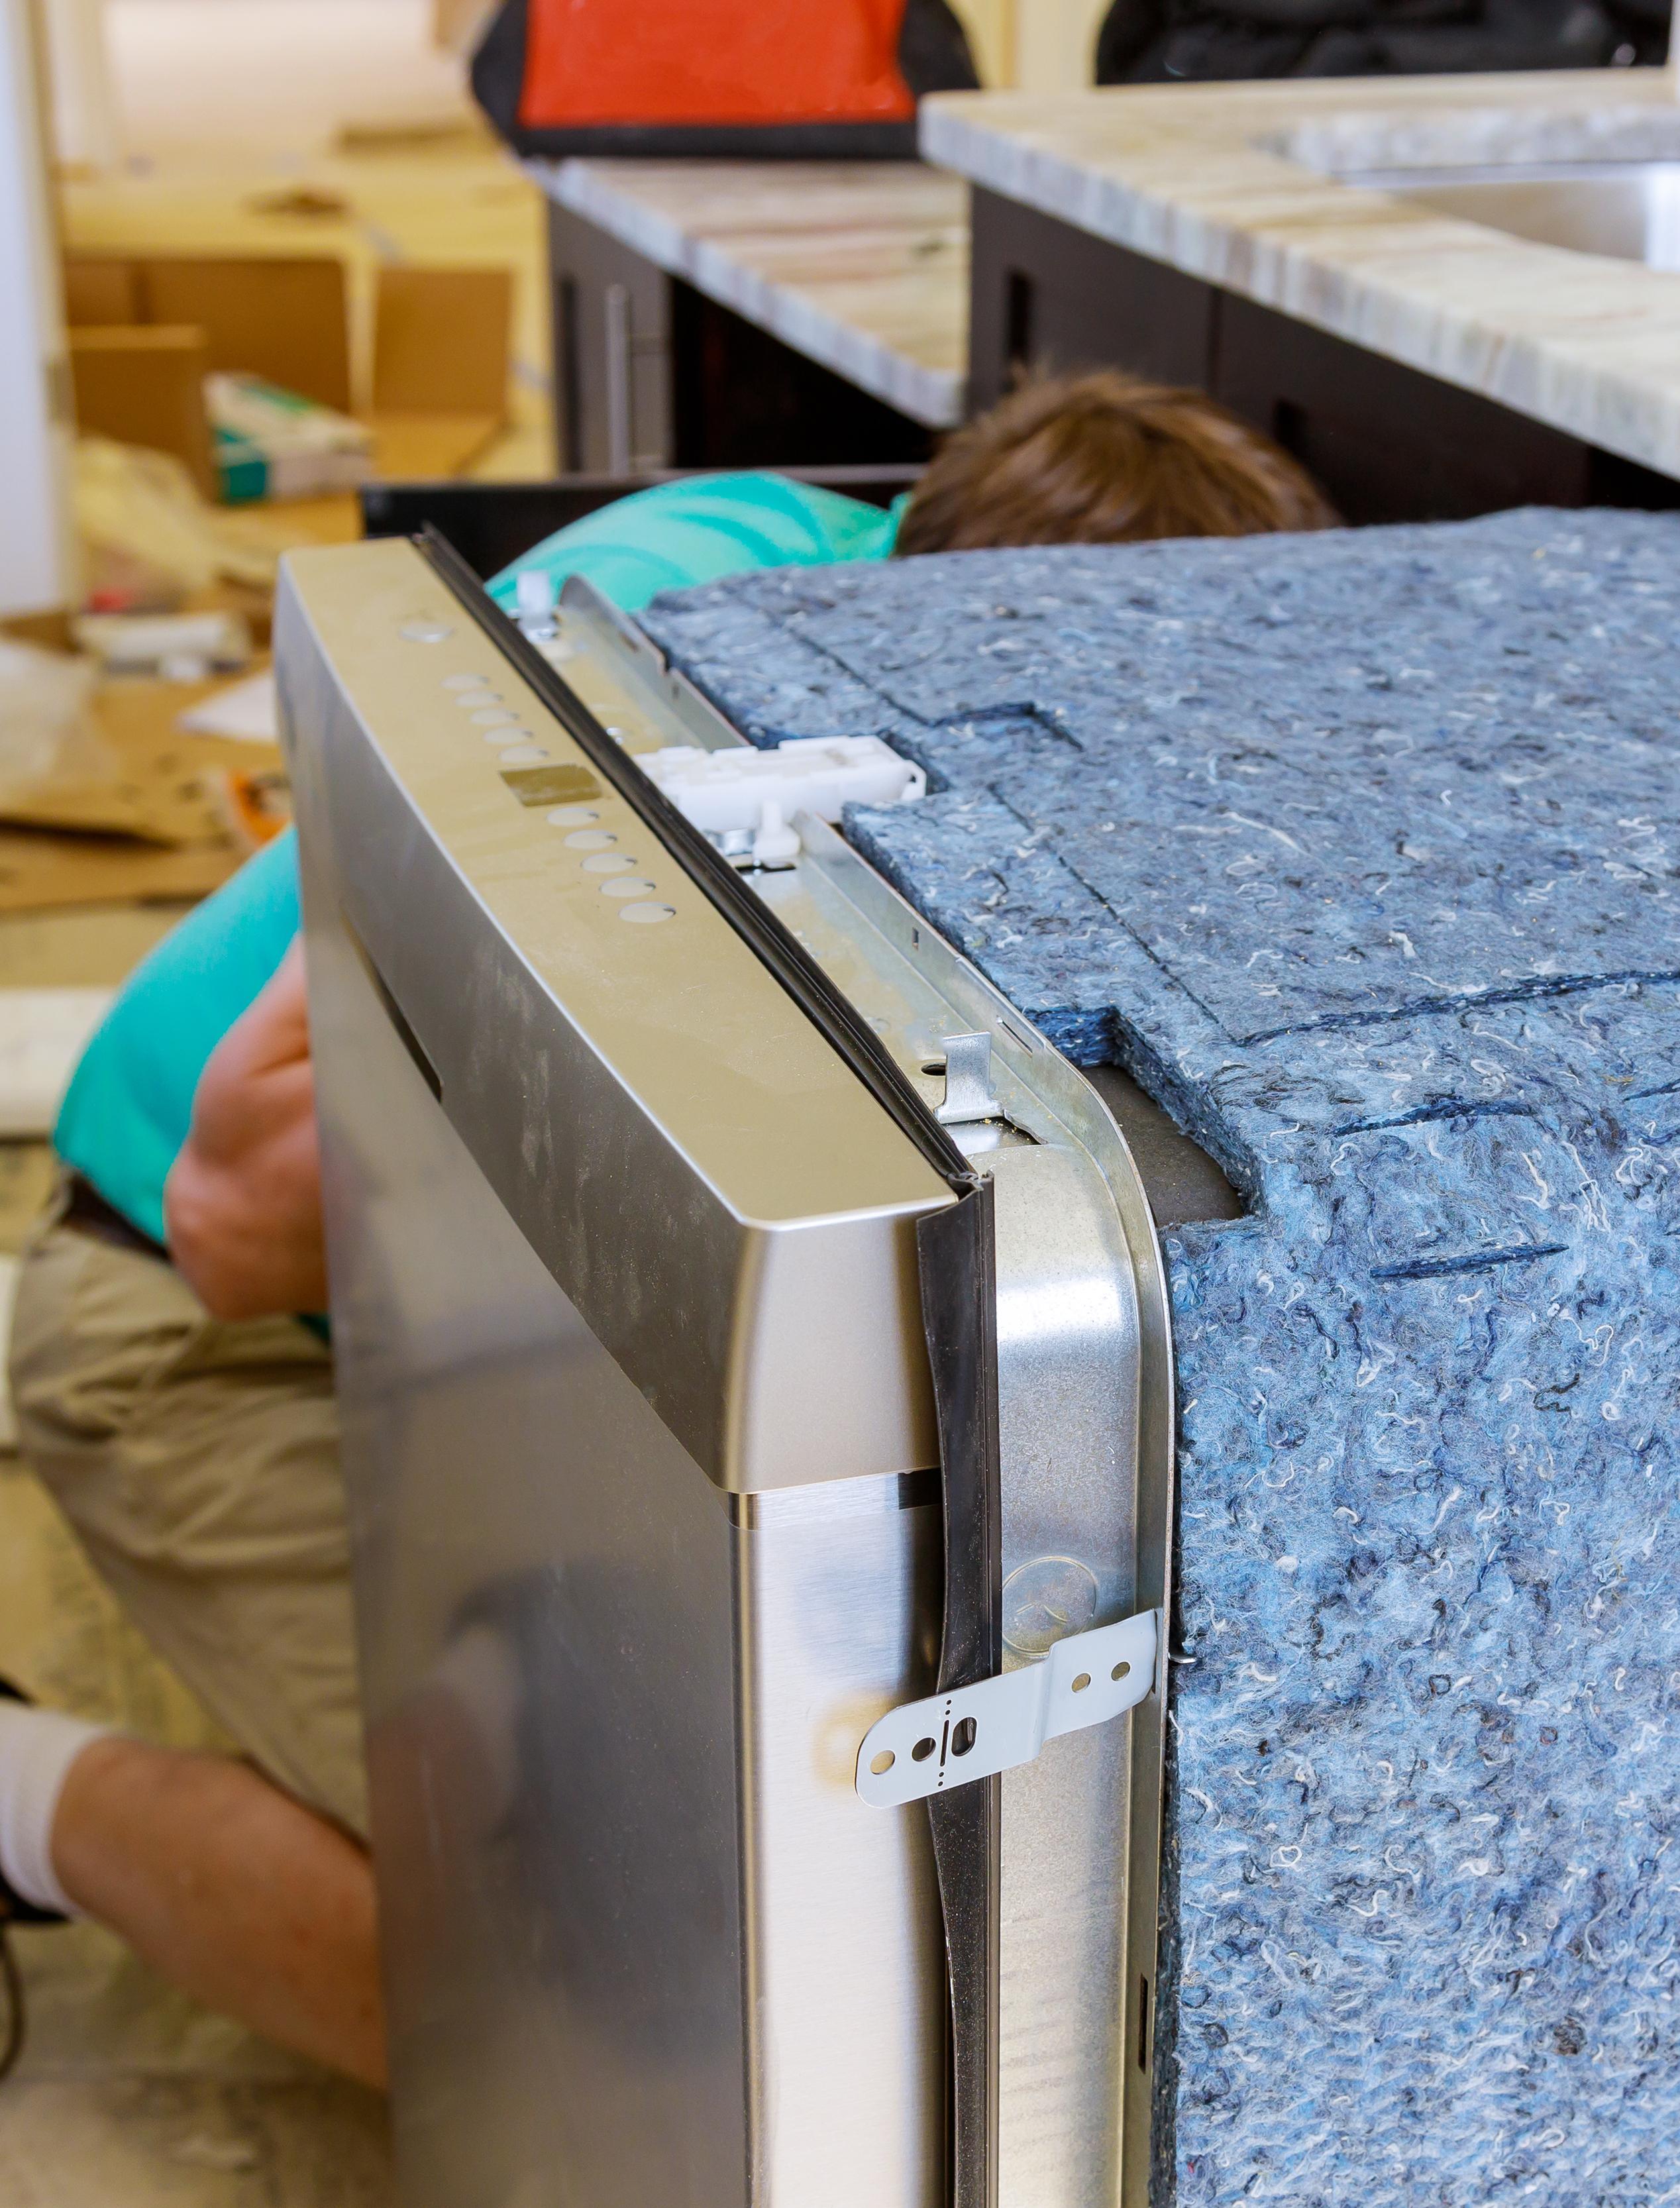 plumber-repair-in-the-household-dishwasher-machine-NZK8YMY